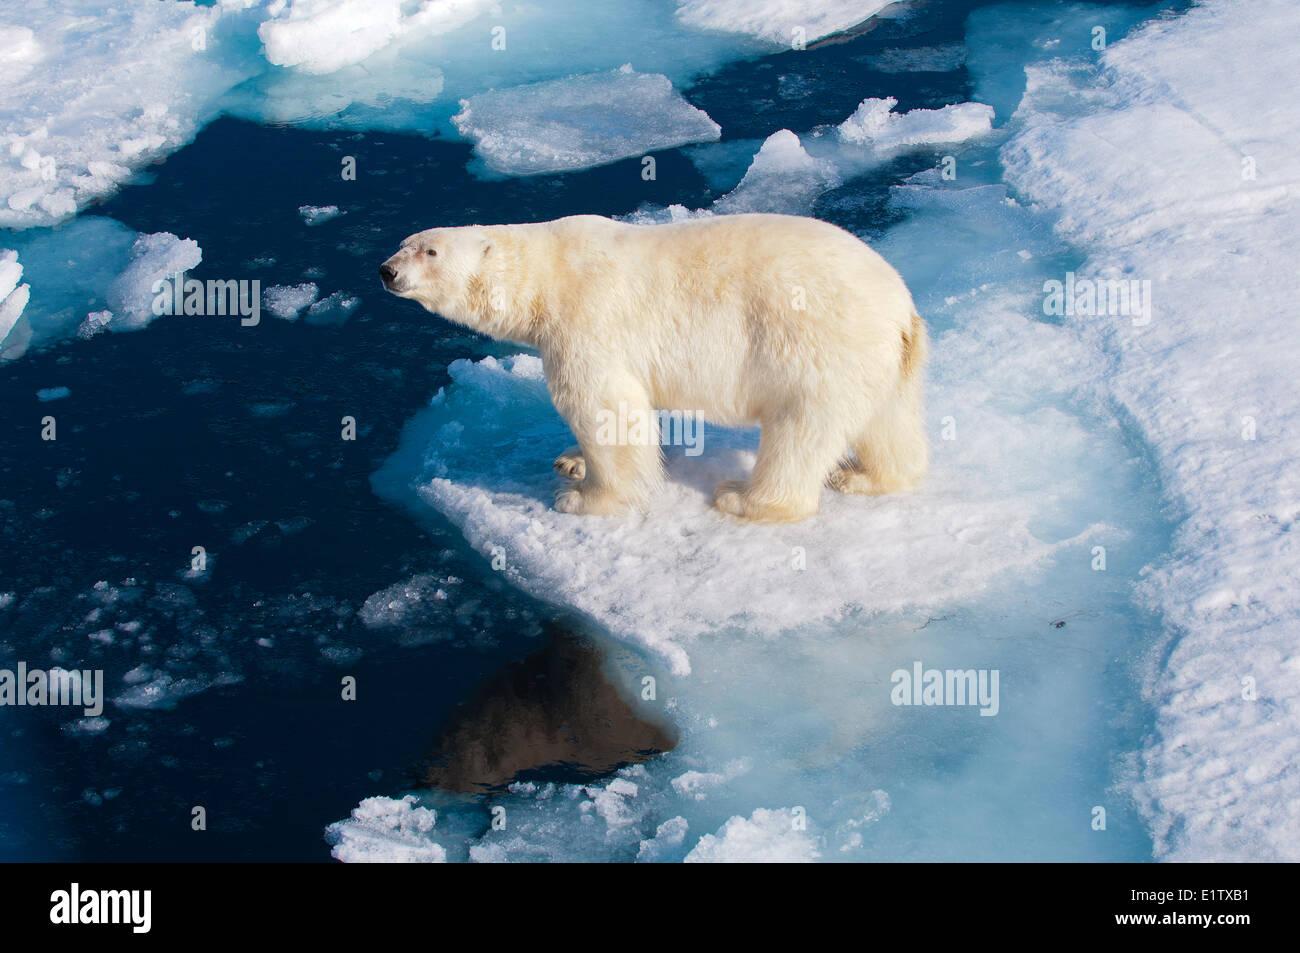 El oso polar (Ursus maritimus) sobre bloques de hielo, Svalbard, Archipiélago Ártico noruego Imagen De Stock